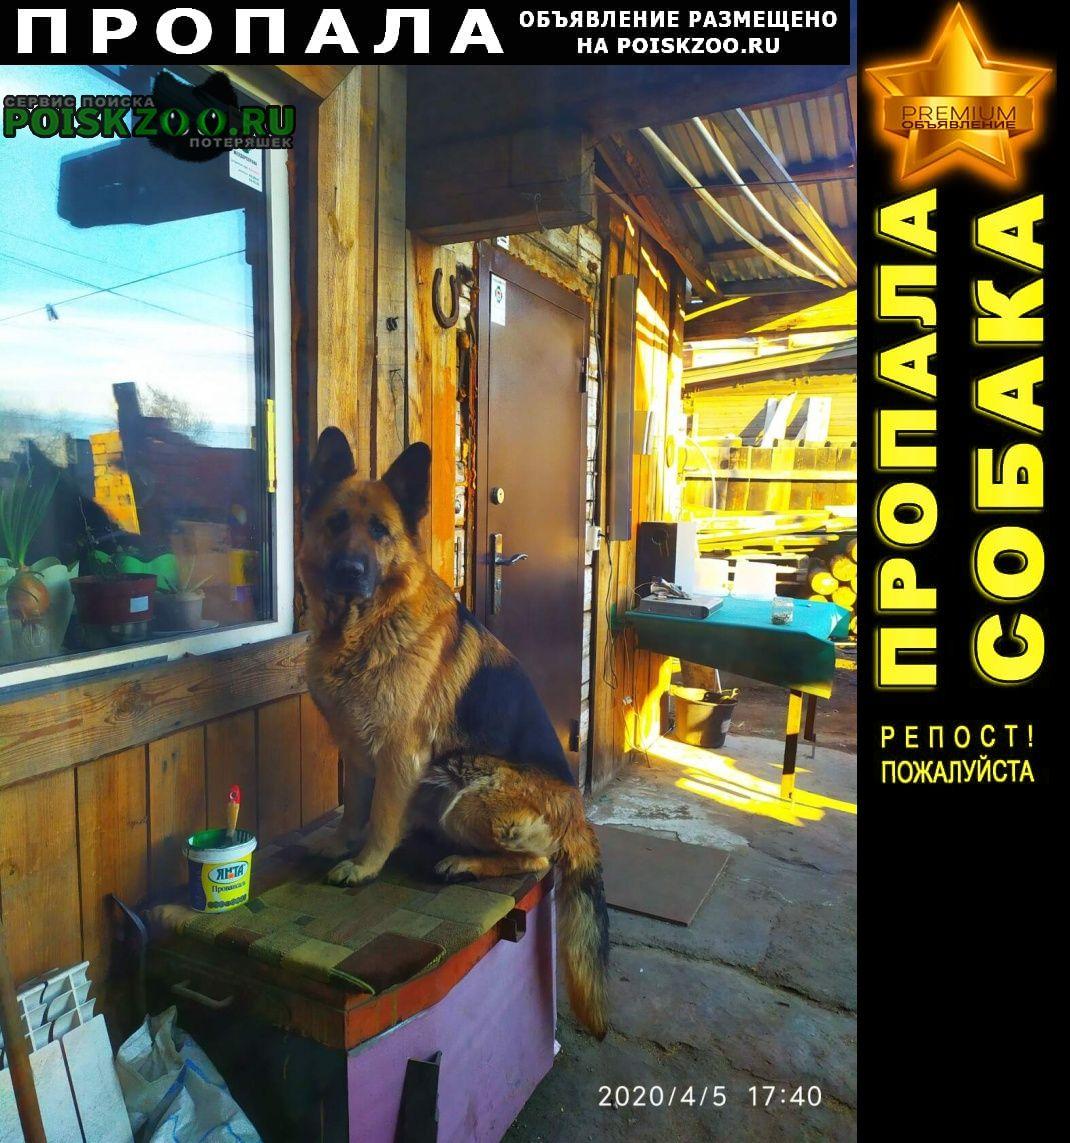 Пропала собака срочно, срочно, срочно  Иркутск